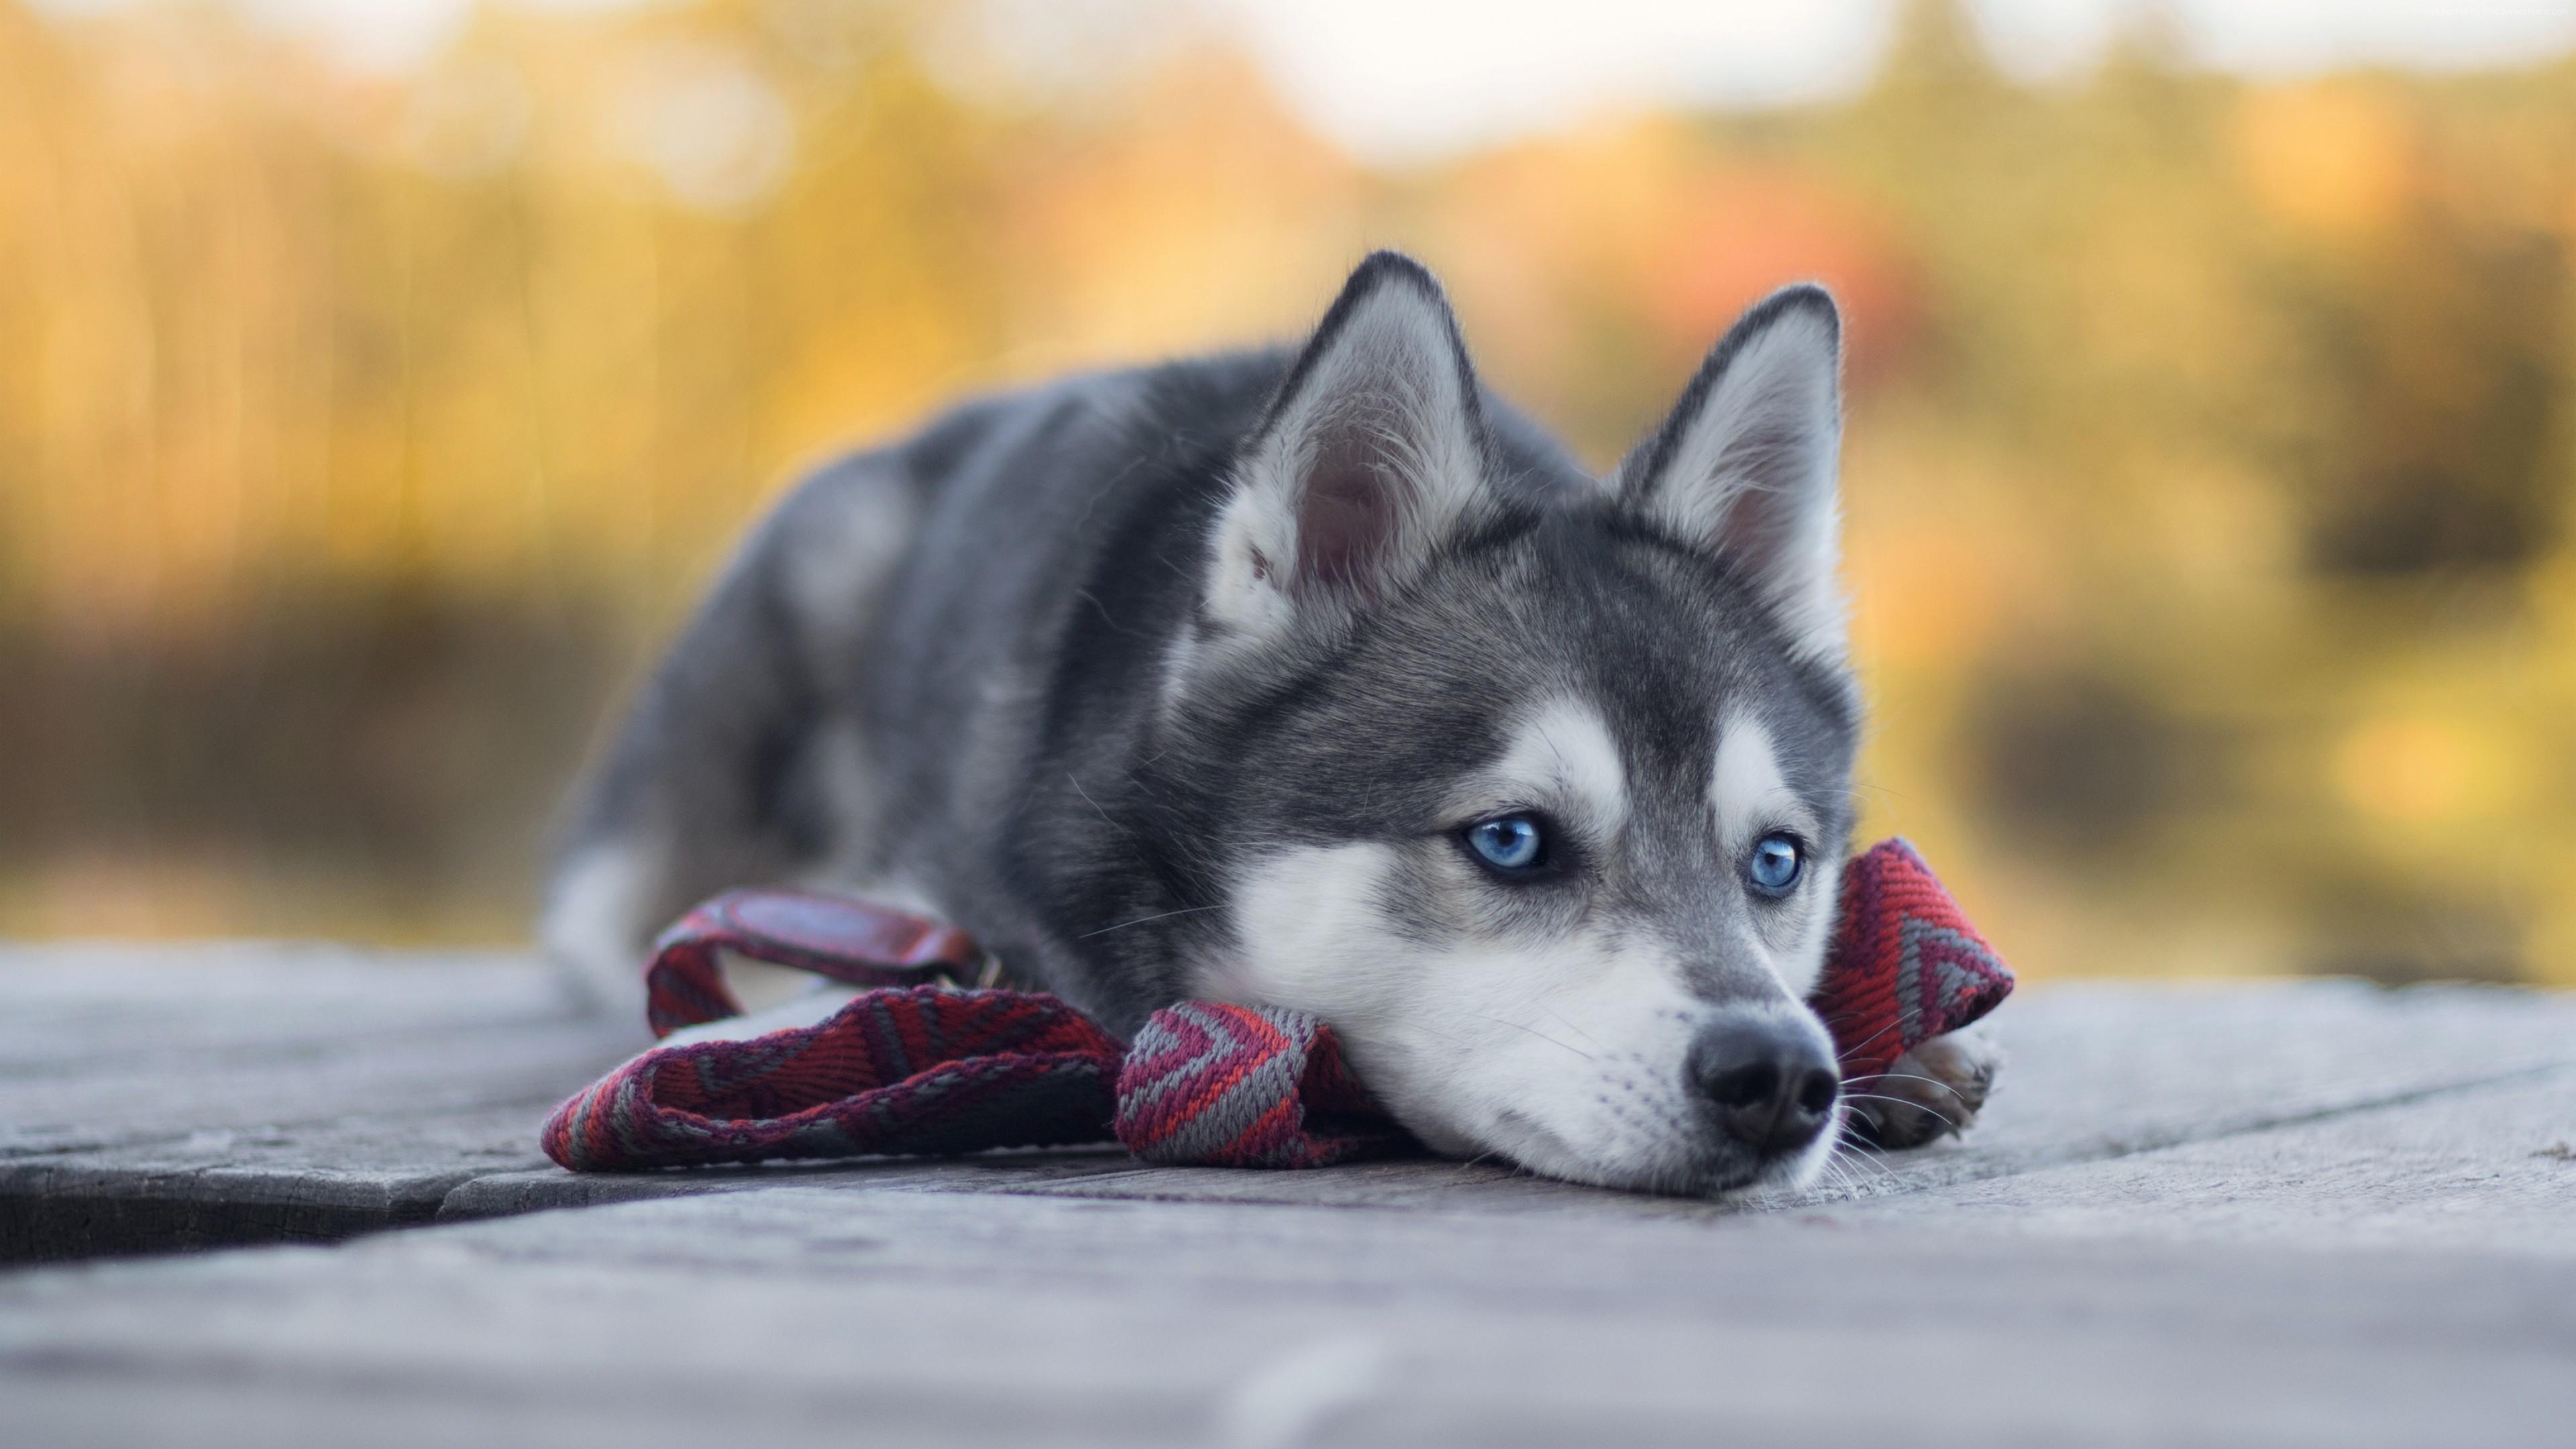 Wallpaper Husky, dog, cute animals, 4K ...